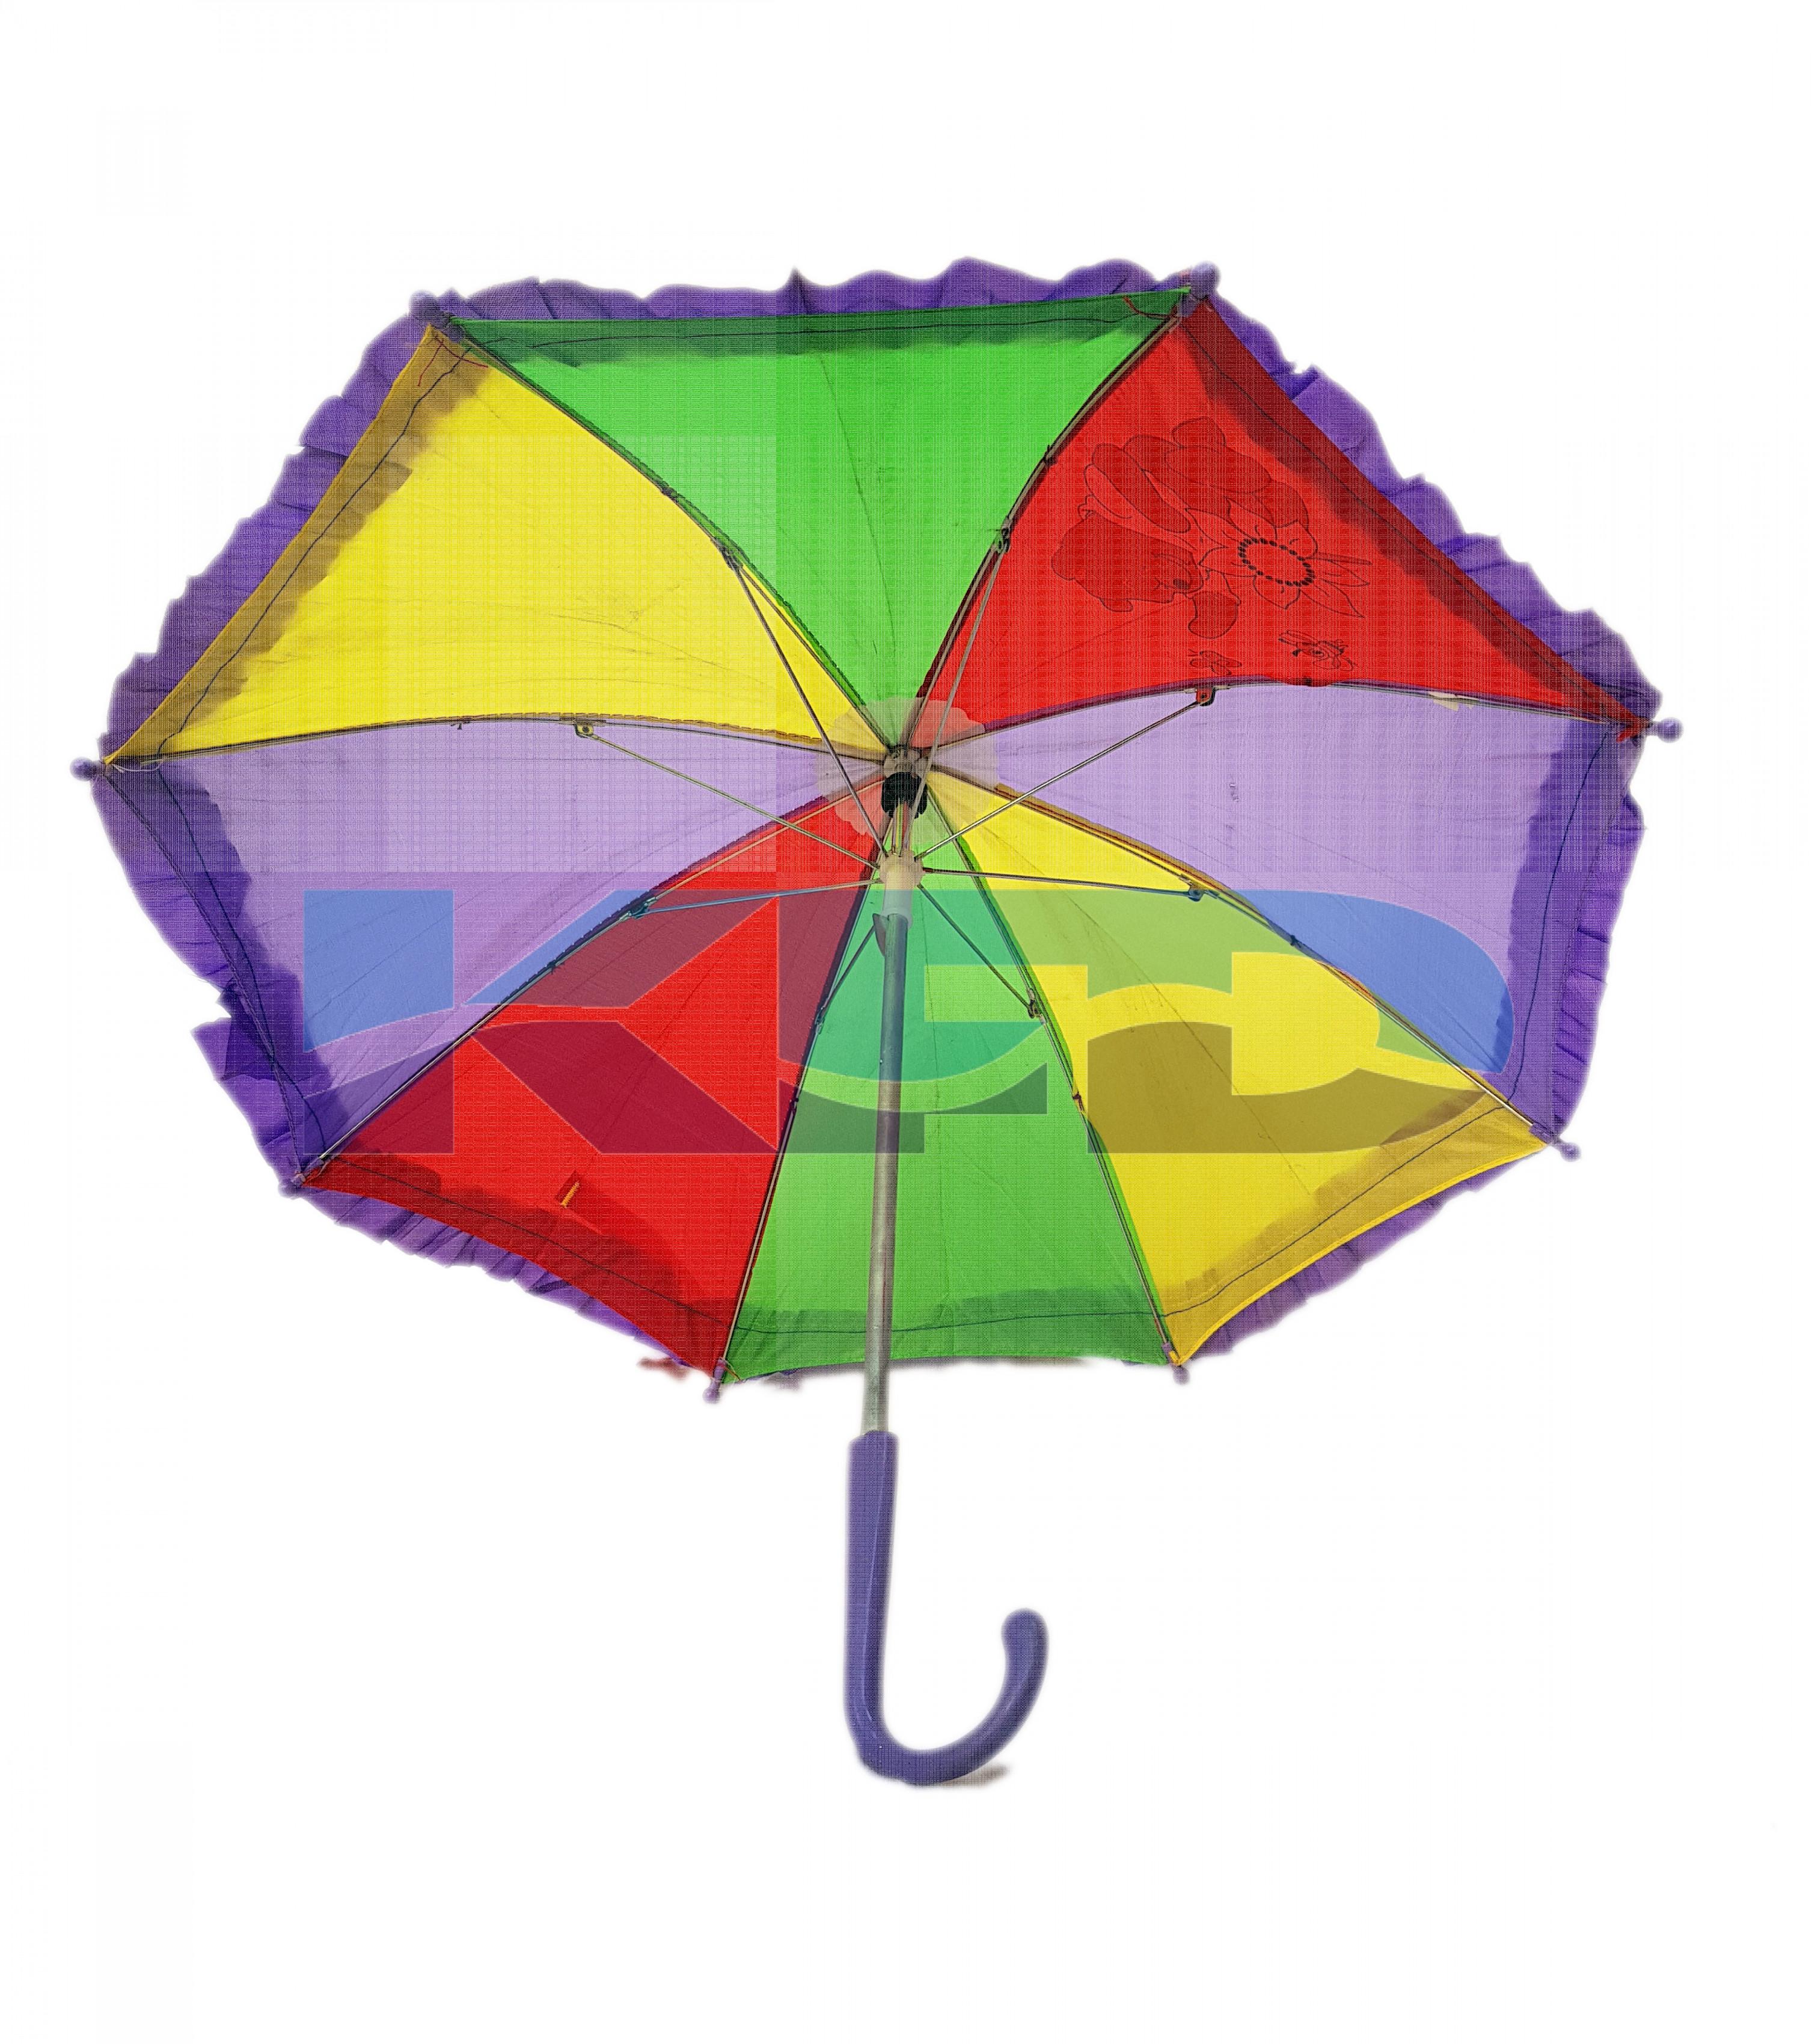 Rainbow Umbrella accessories for kids